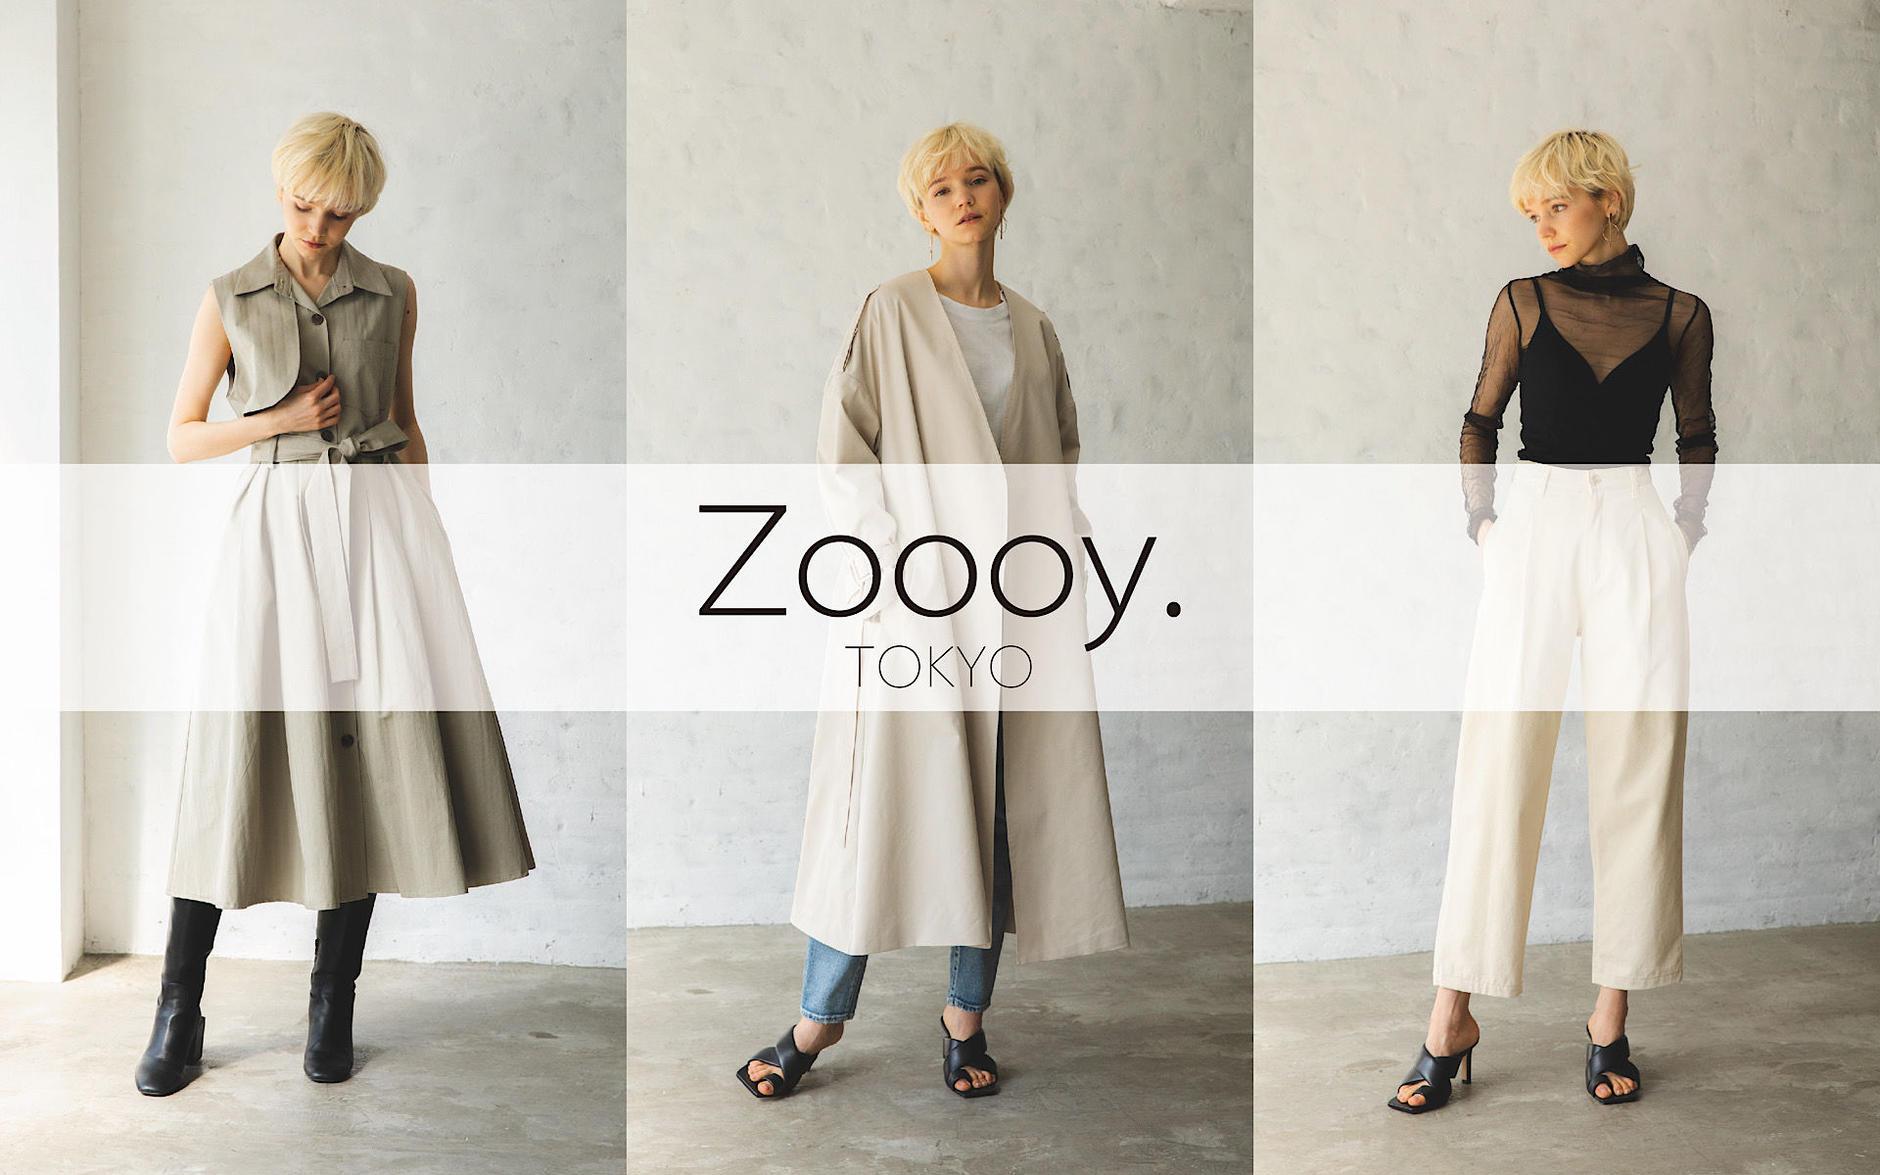 Zoooy.TOKYO|ファッショニスタが提案するキュレーションブランドの新業態ゾーイトウキョウ|